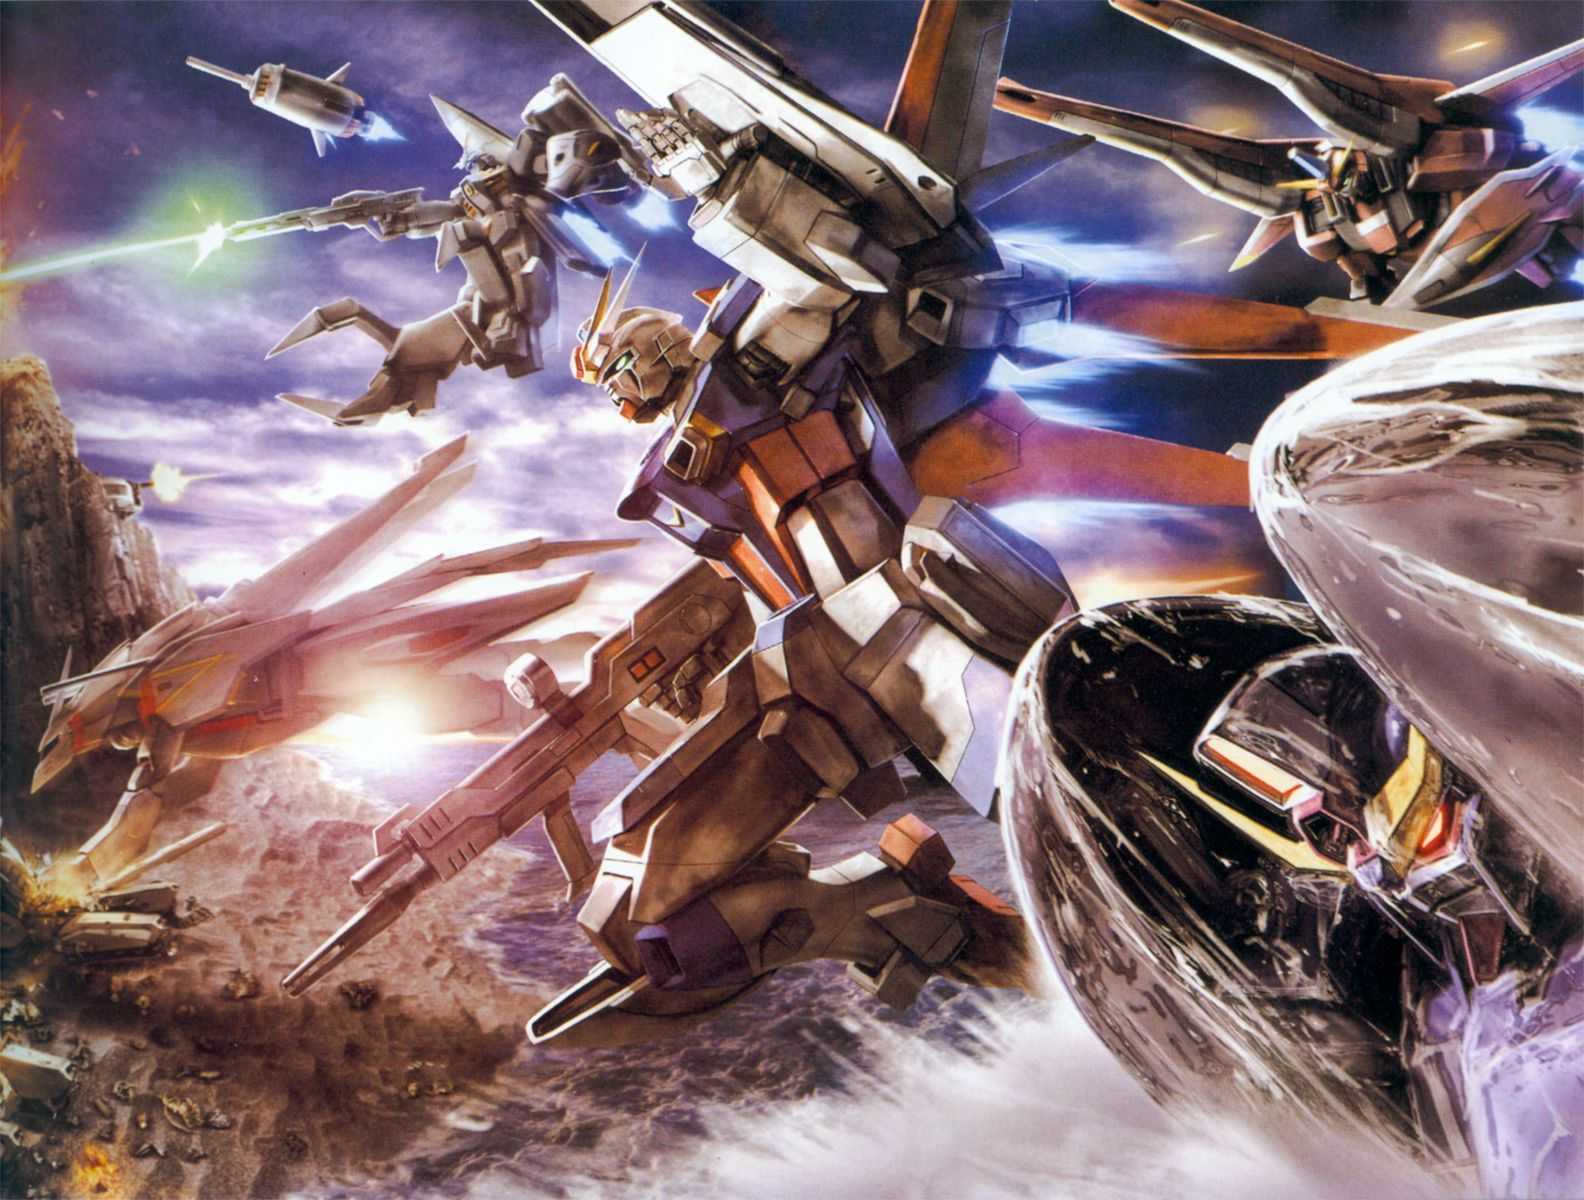 Tags: Anime, Mobile Suit Gundam SEED, Strike Gundam, HD Wallpaper, Wallpaper